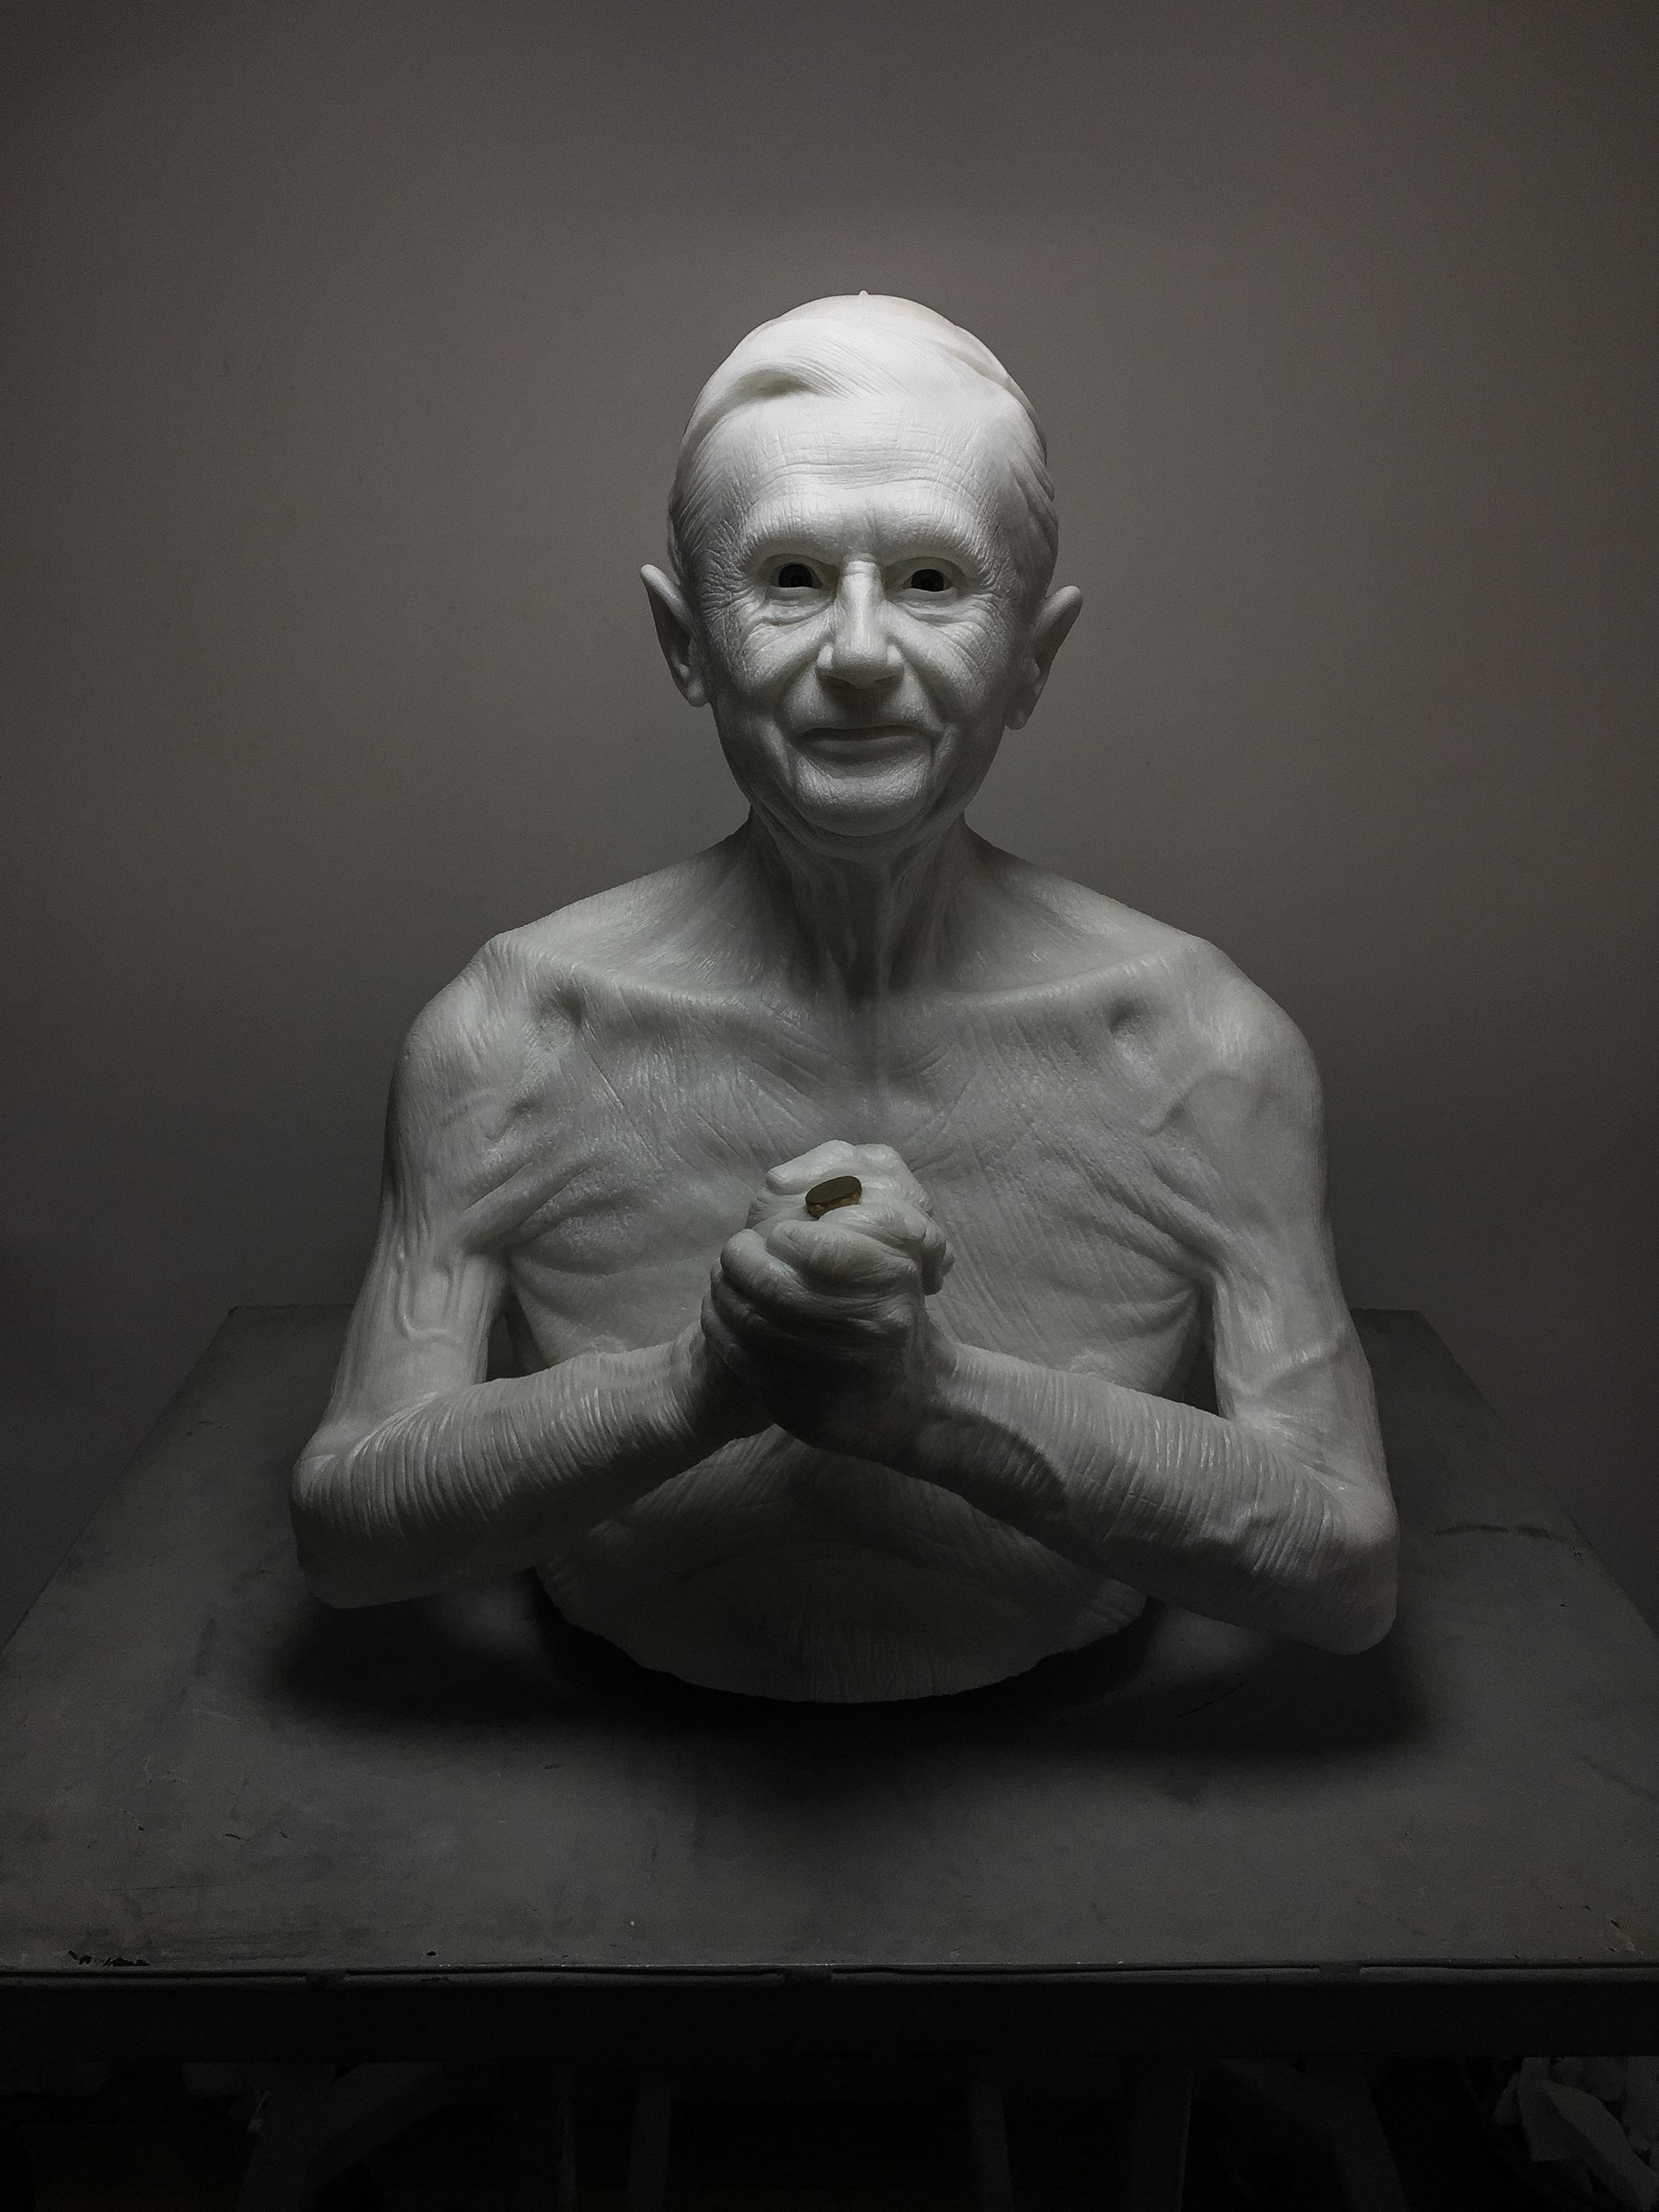 JAGO - Habemus Hominem - 2009 - 2016, marmo statuario (18) (1).jpg